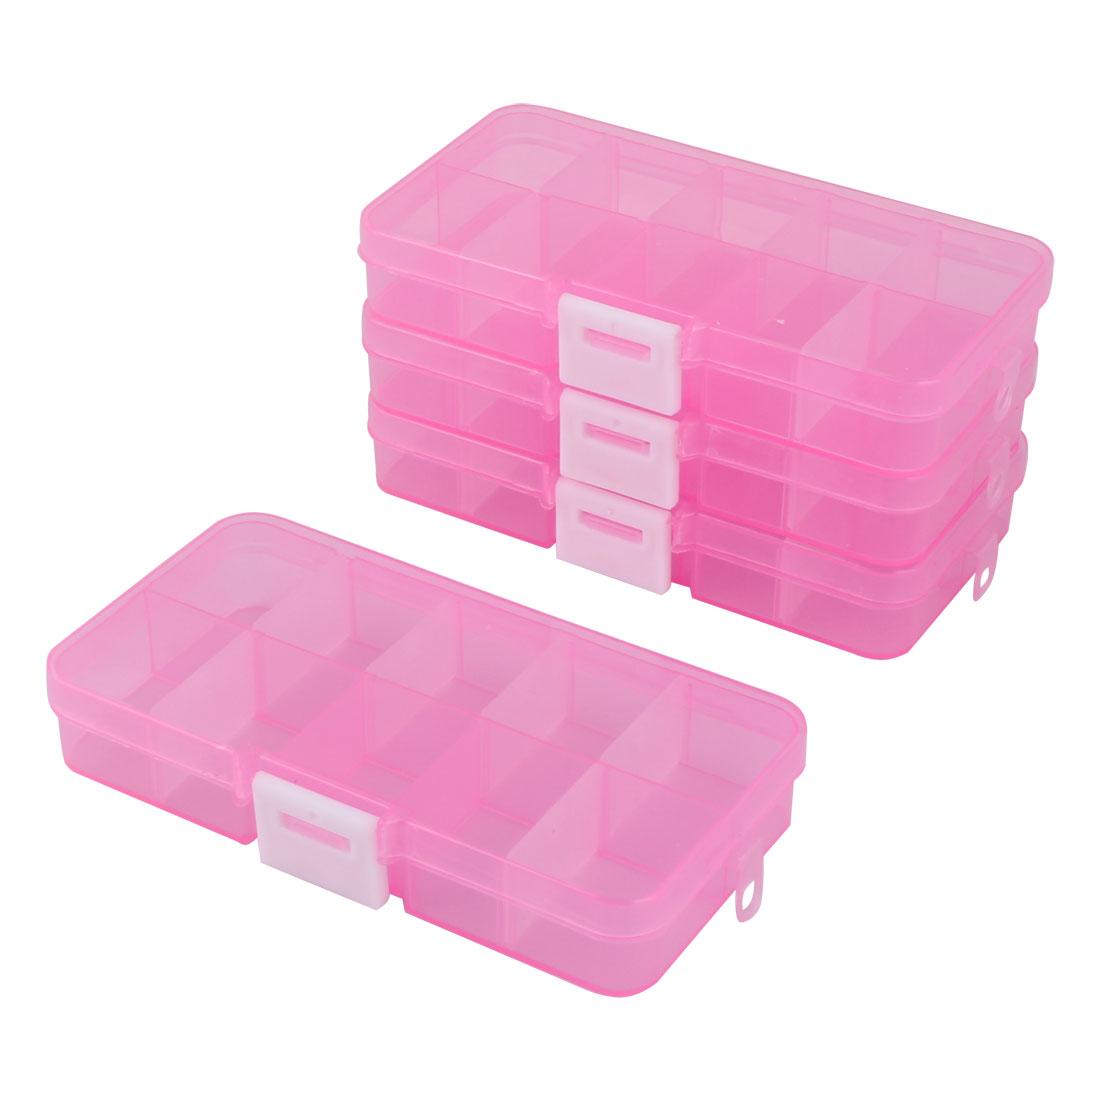 Plastic 10 Slots Dispenser Detachable Capsule Pill Tablet Storage Box Pink 4 Pcs